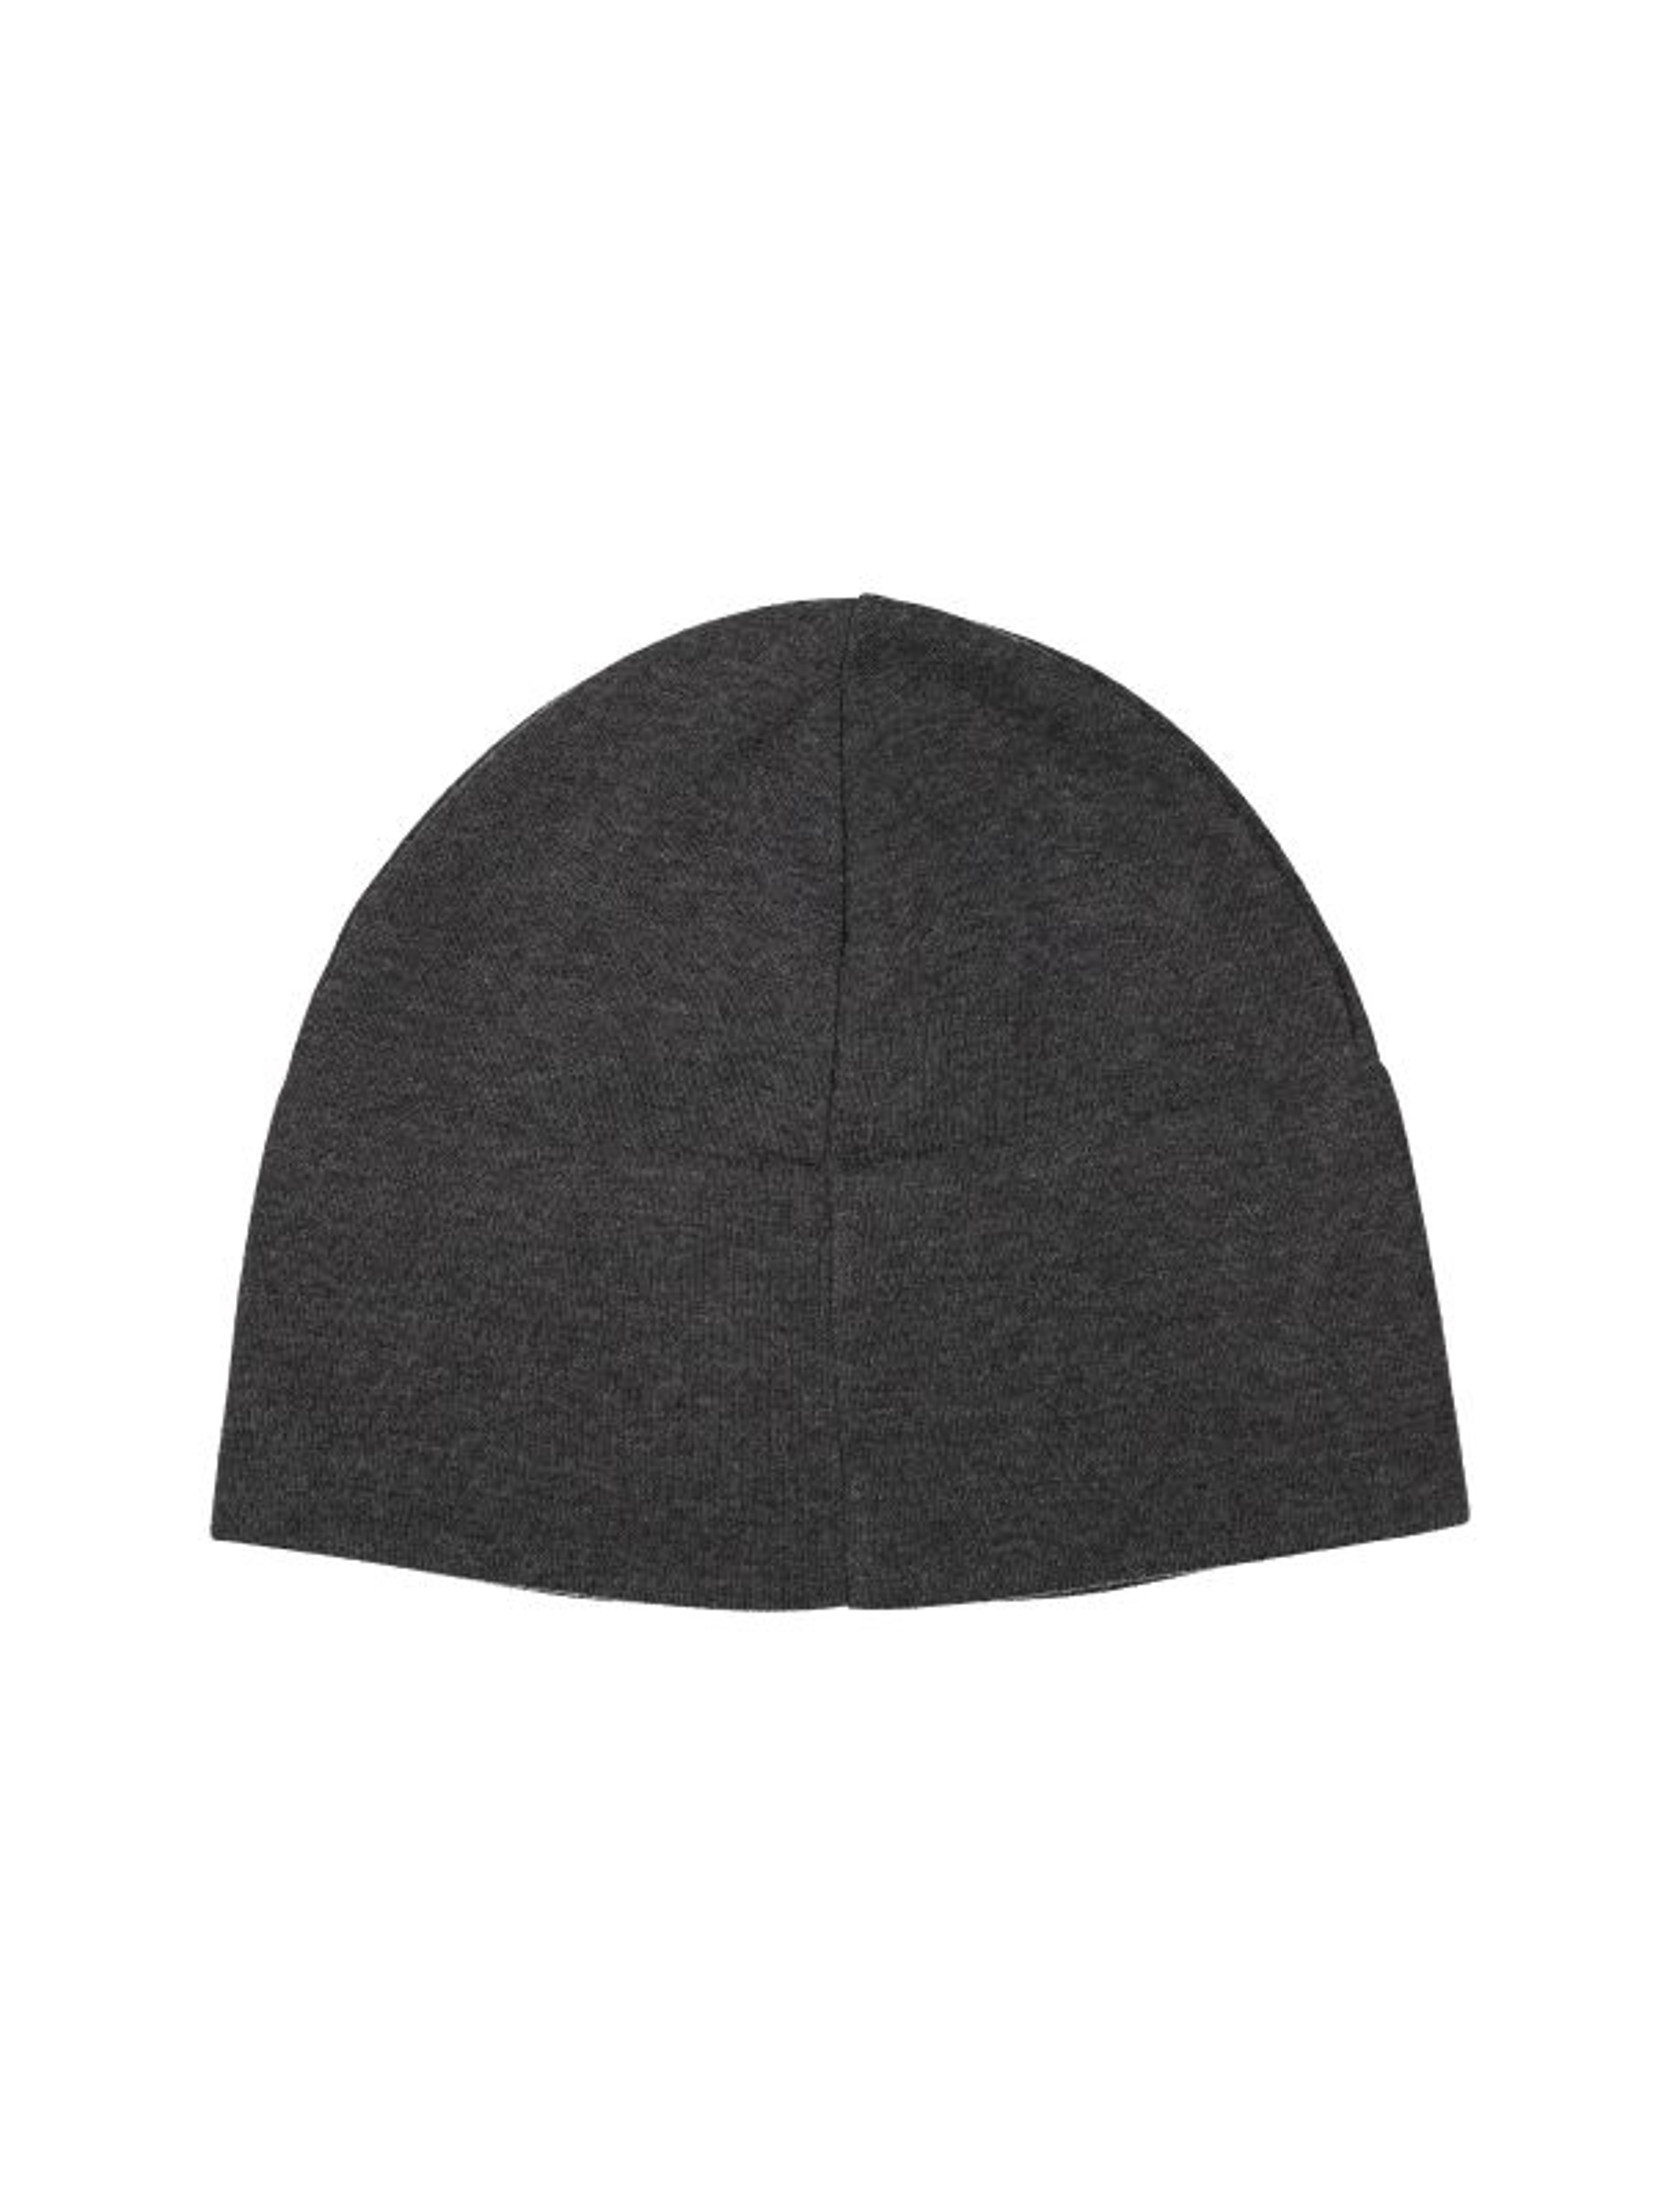 کلاه بافتنی مردانه ZNE - آدیداس